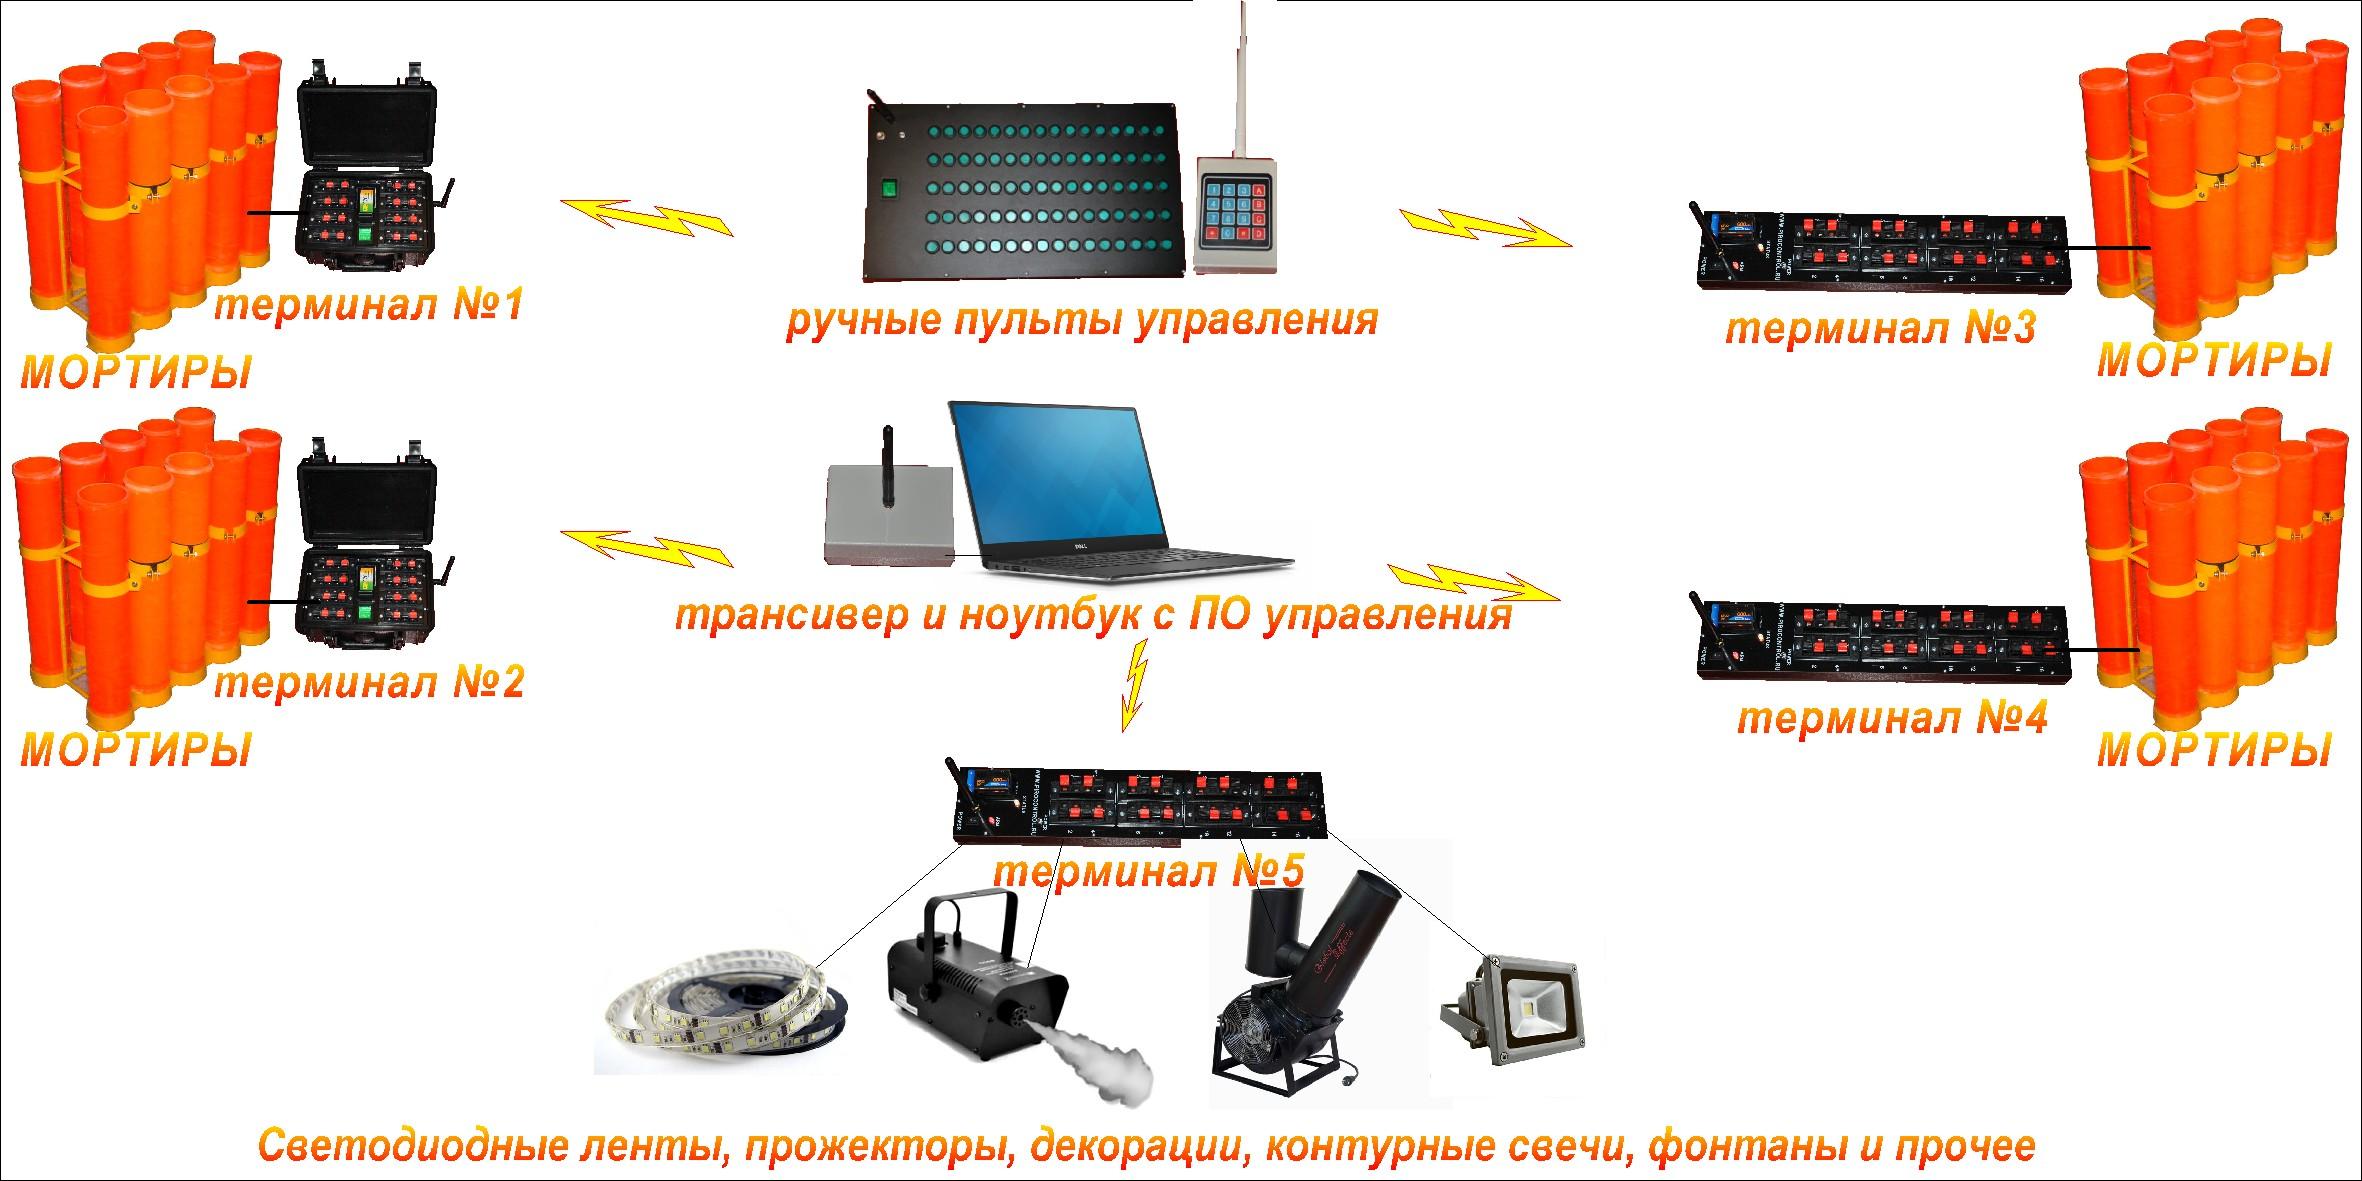 Описание системы   пульты Fixeria Fireworks Control: http://pirocontrol.ru/opisanie-sistemy